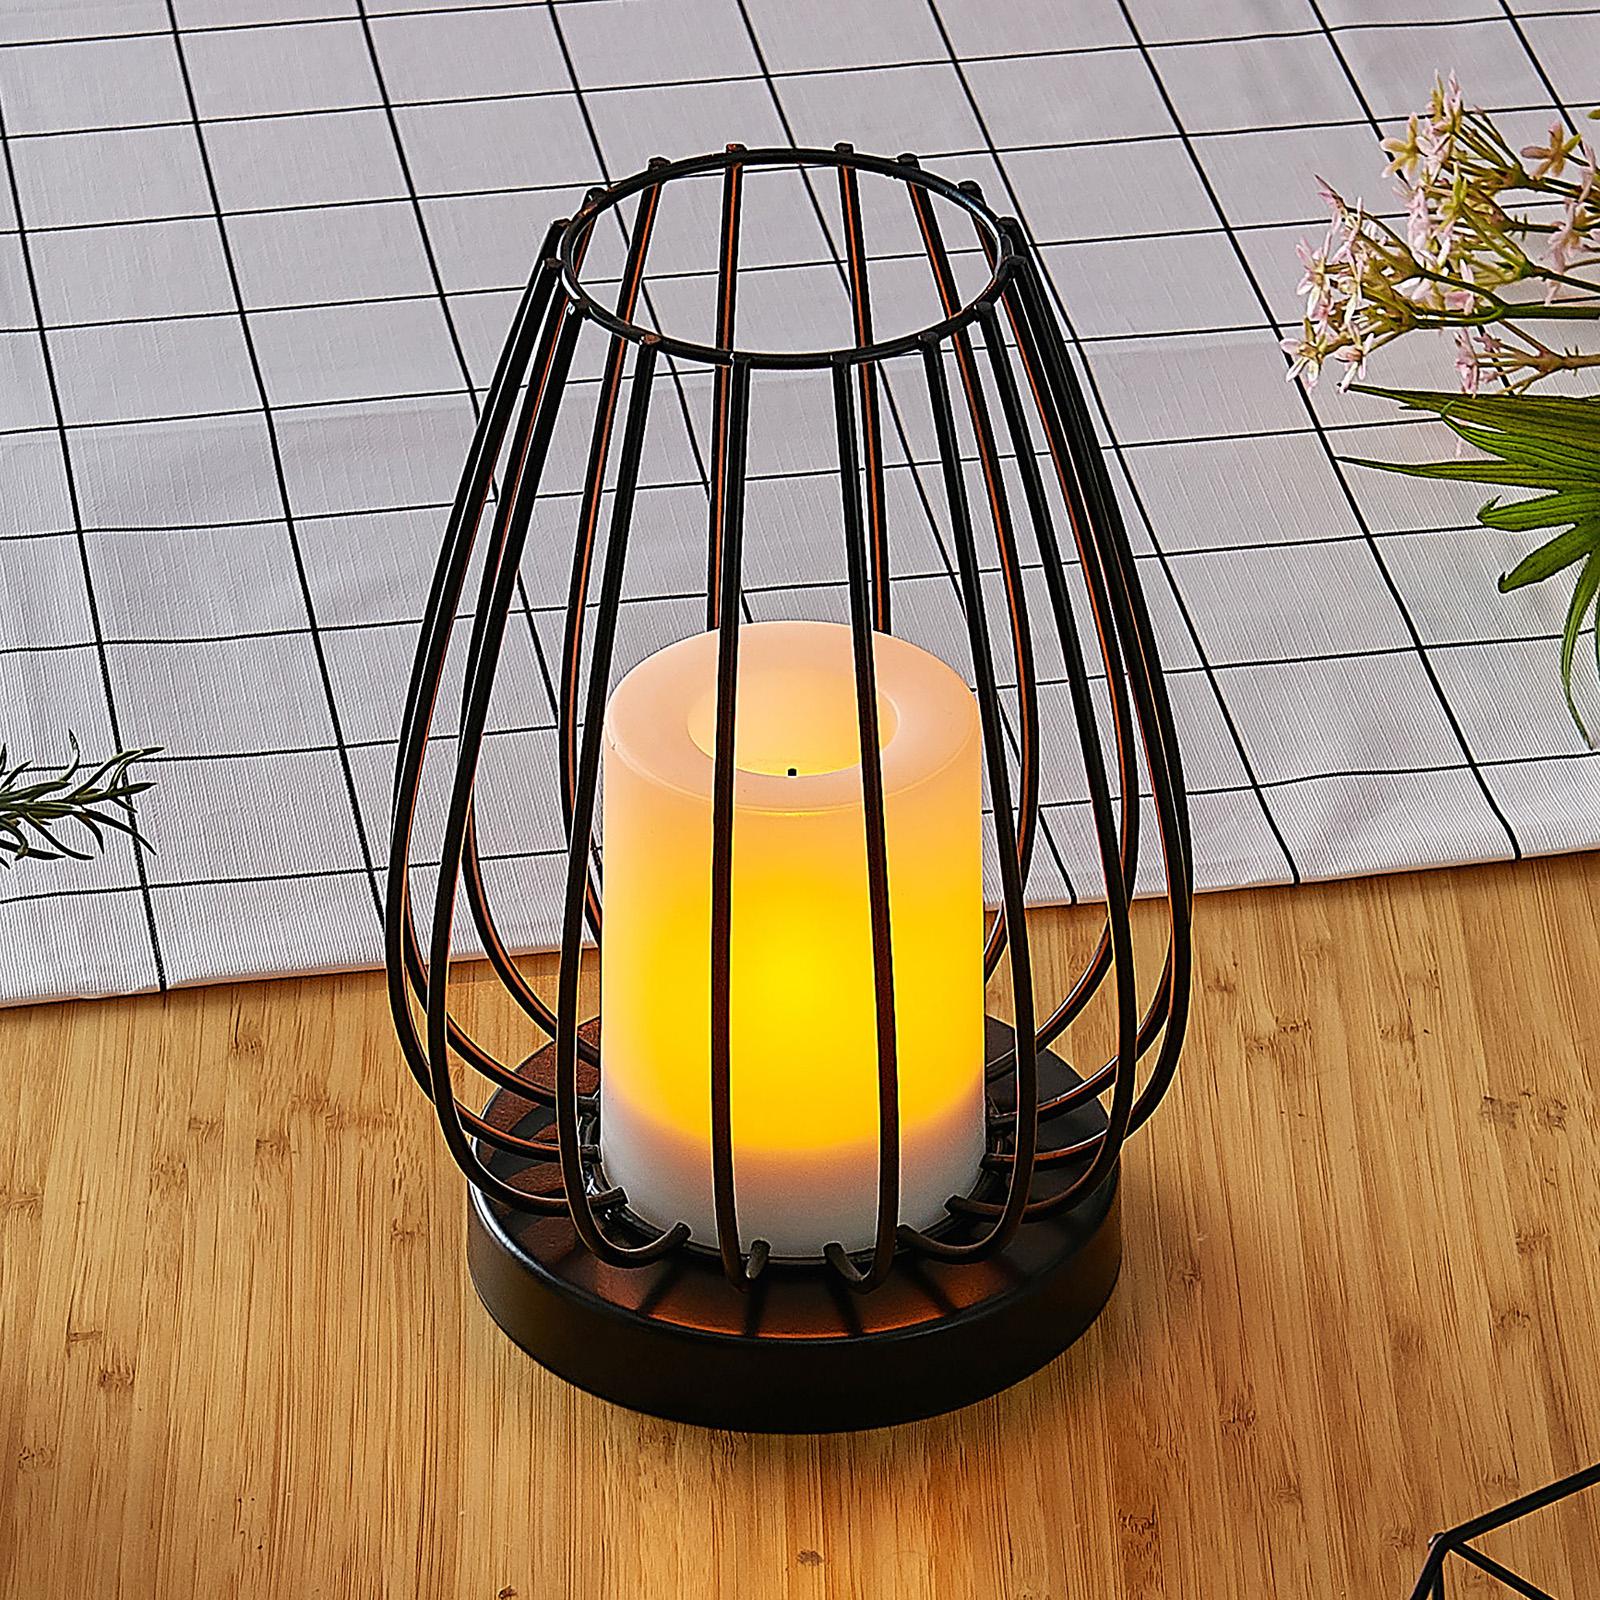 Lampada LED solare Hannika, luce ambra tremolante